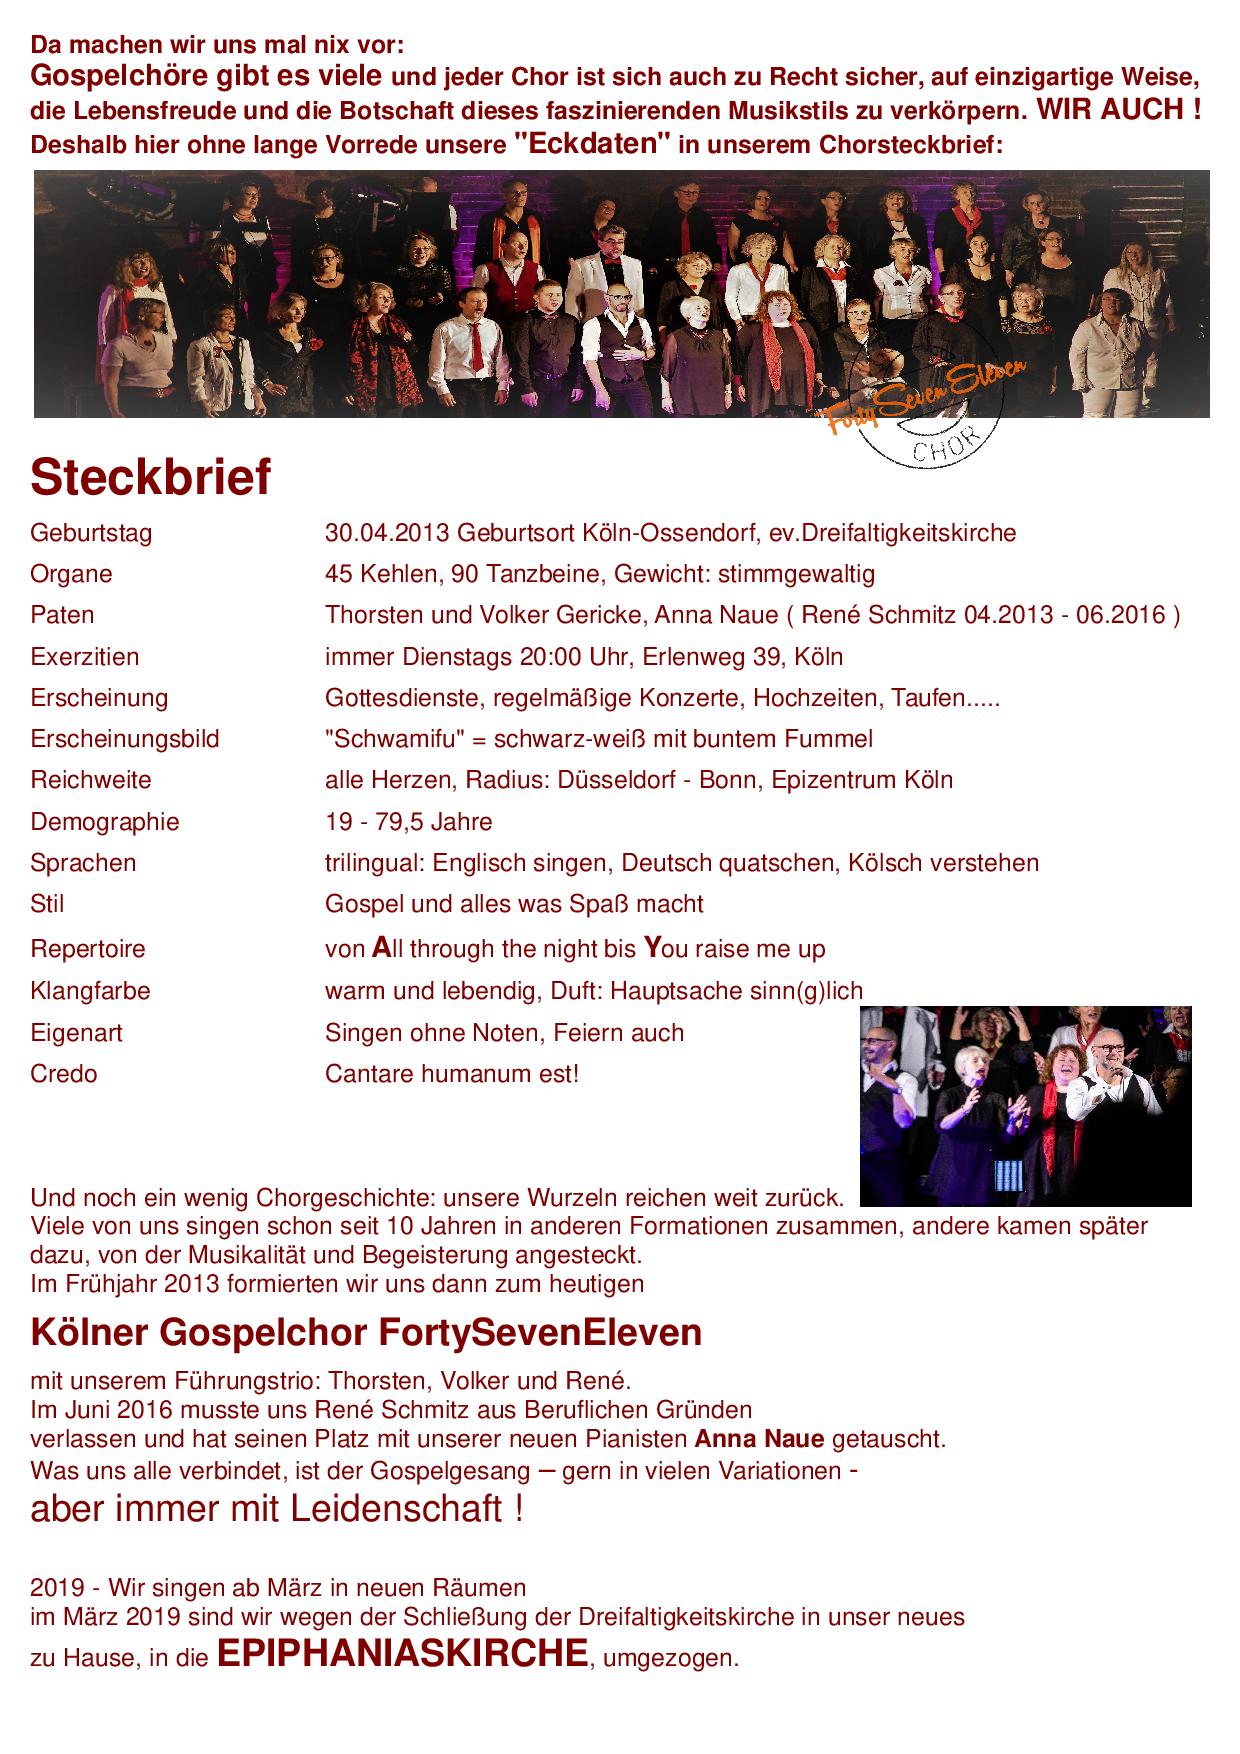 https://fortyseveneleven.koeln/wp-content/uploads/2019/04/STECKBRIEF-19.png